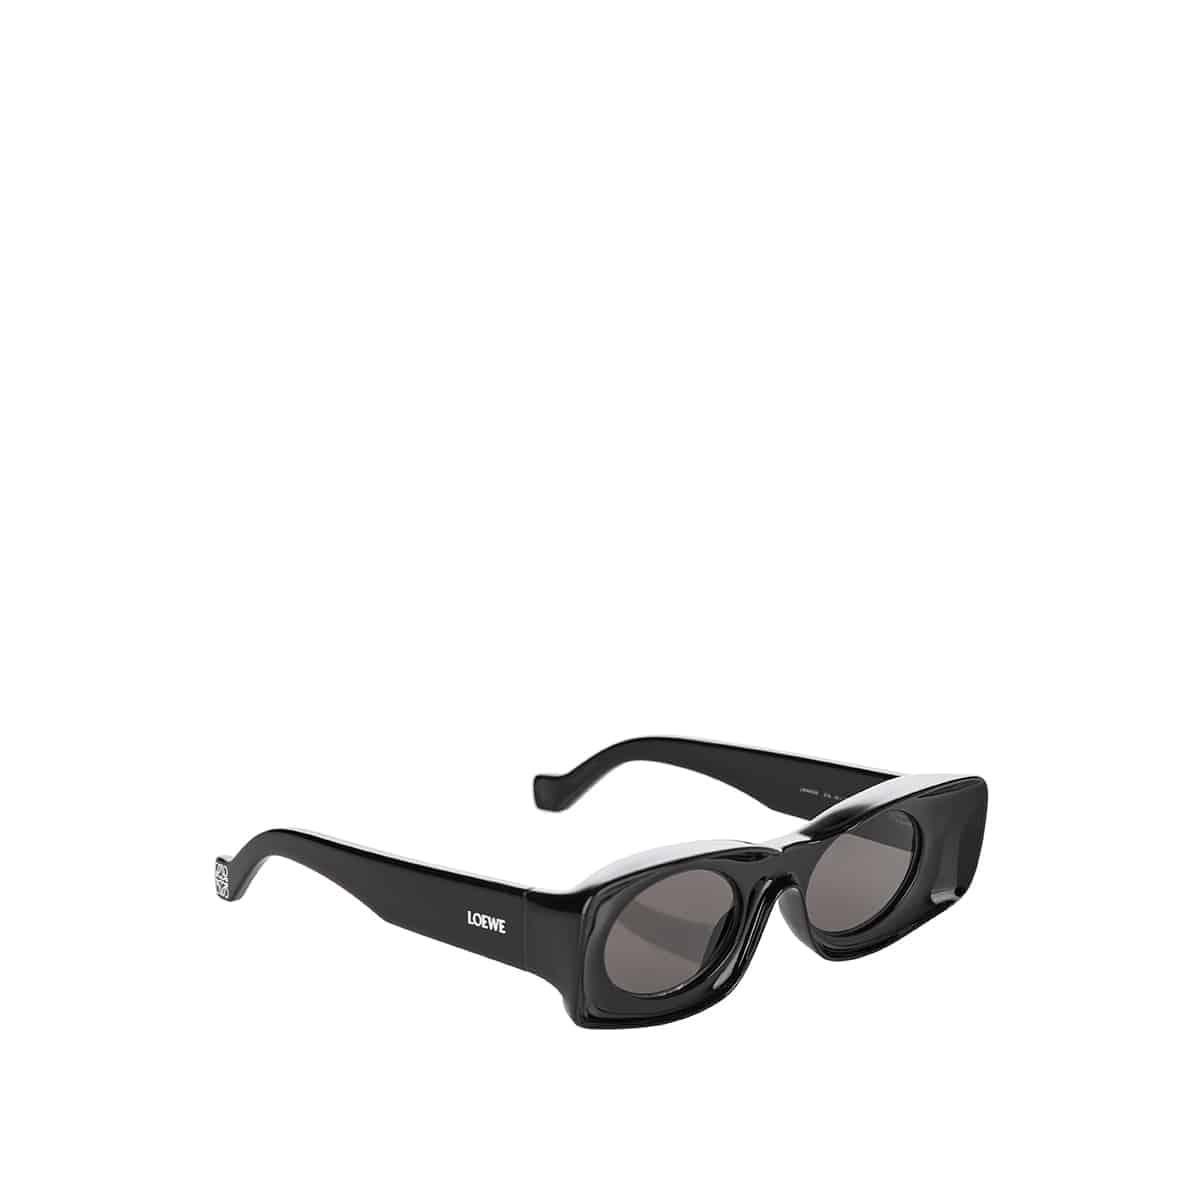 Paula's Ibiza original sunglasses